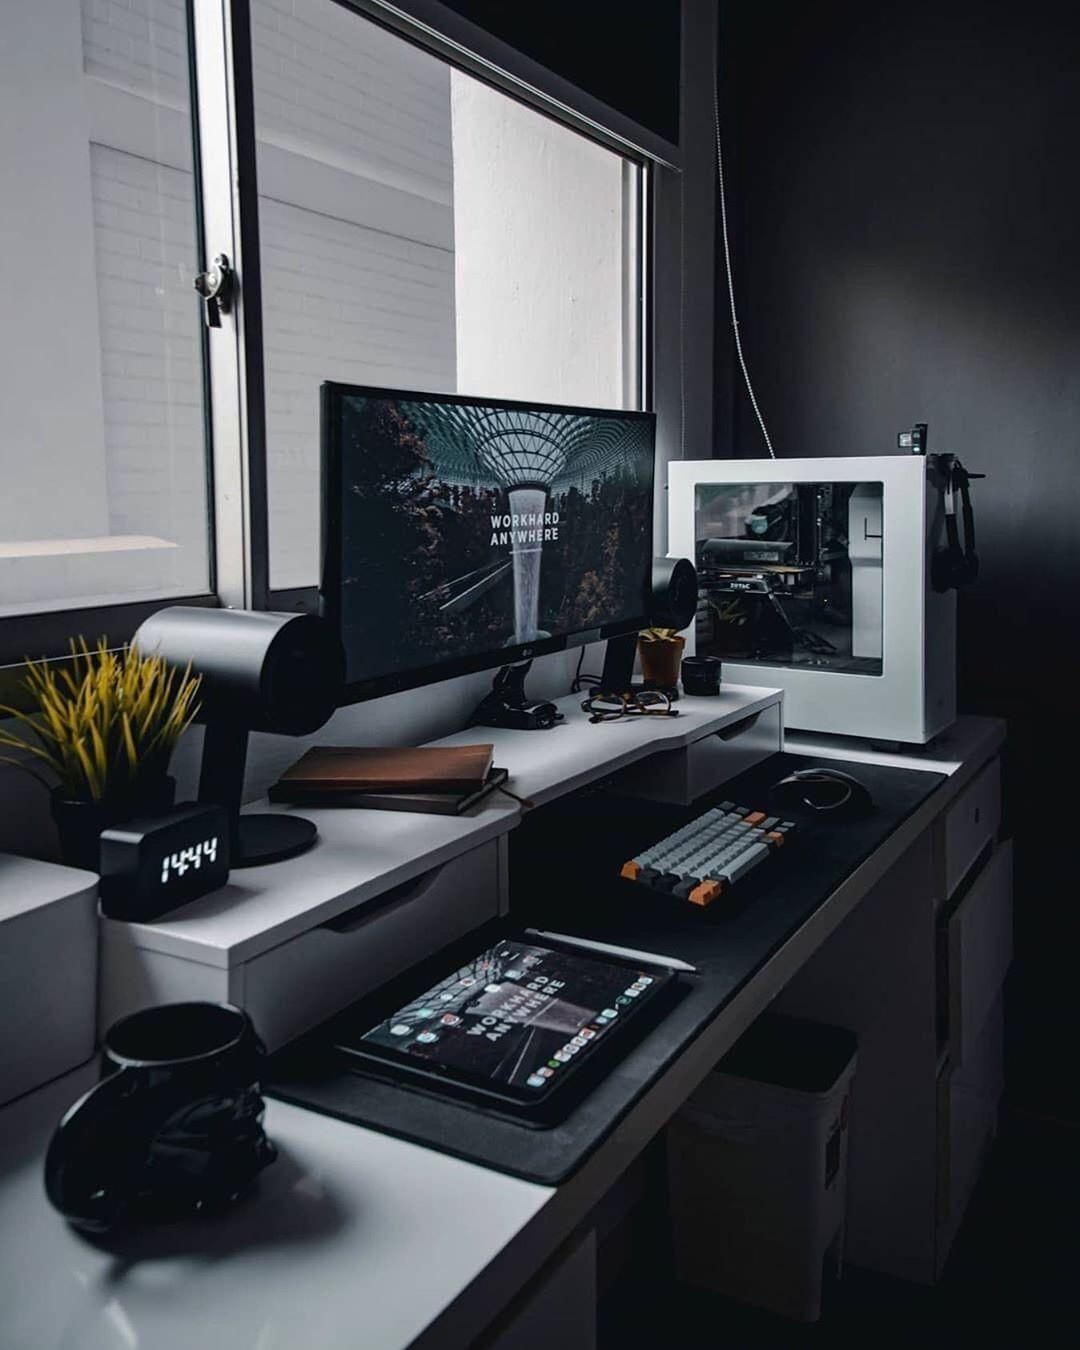 Hashnode On Instagram What Inspires You As A Developer